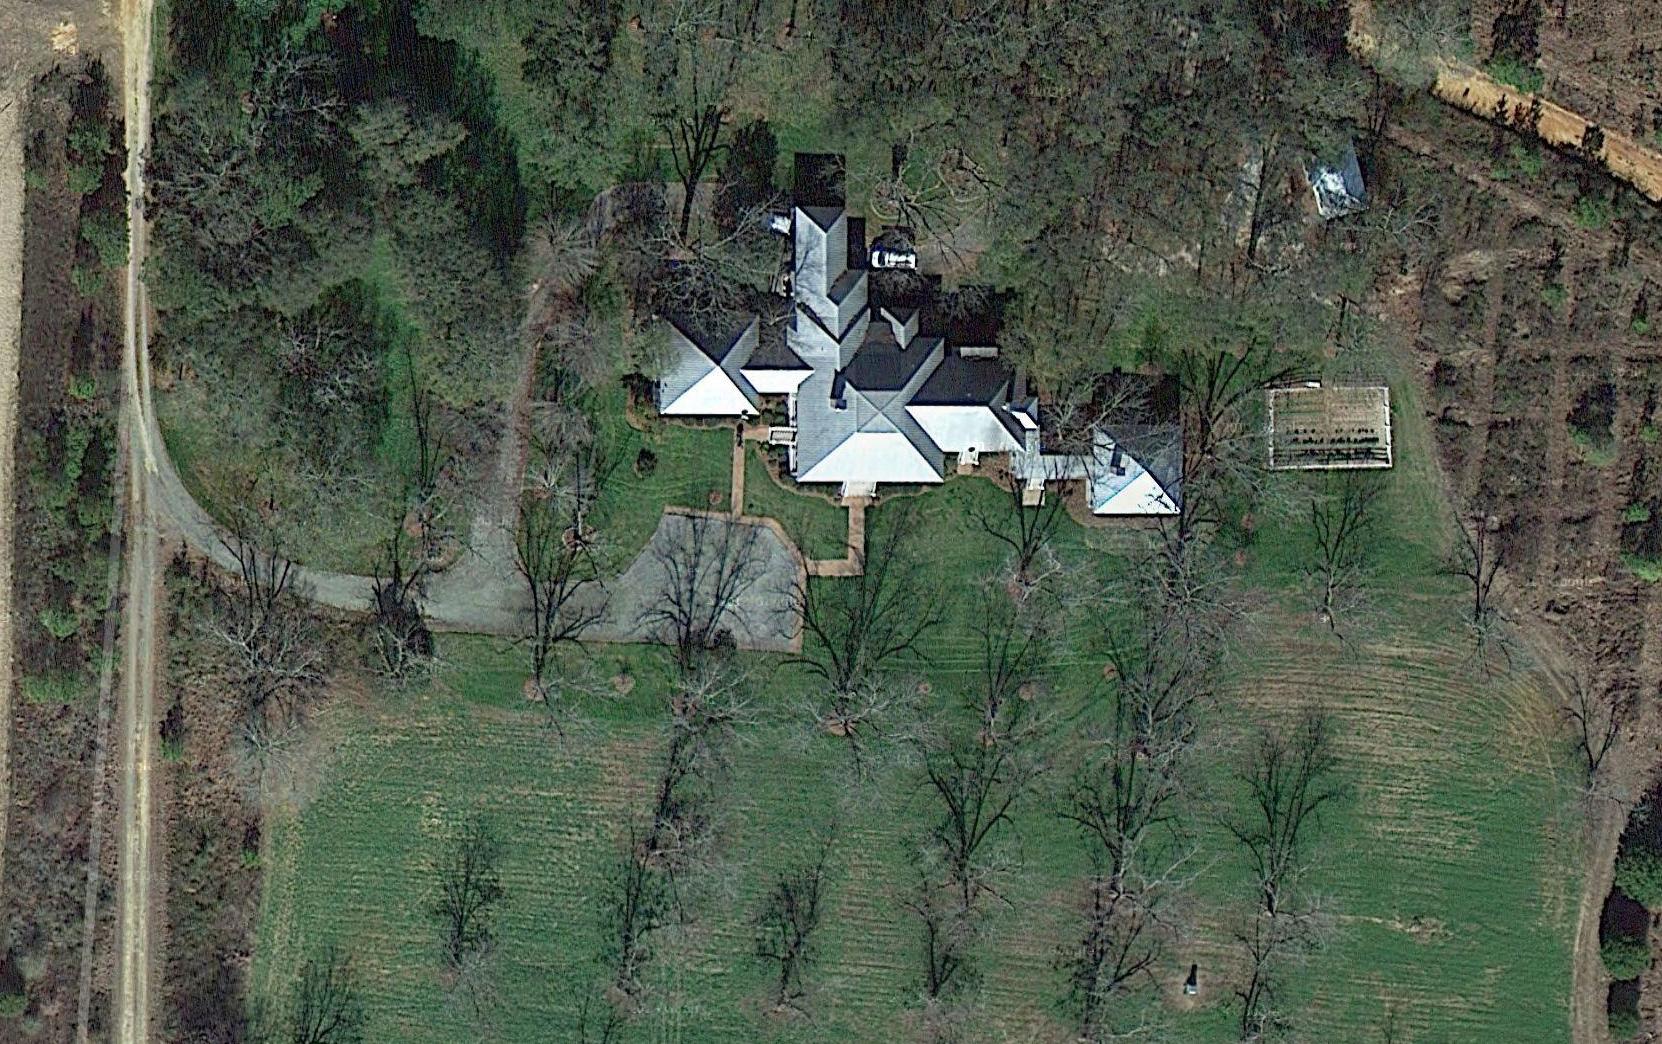 becker_aerial_main-house001 copy 2.jpg